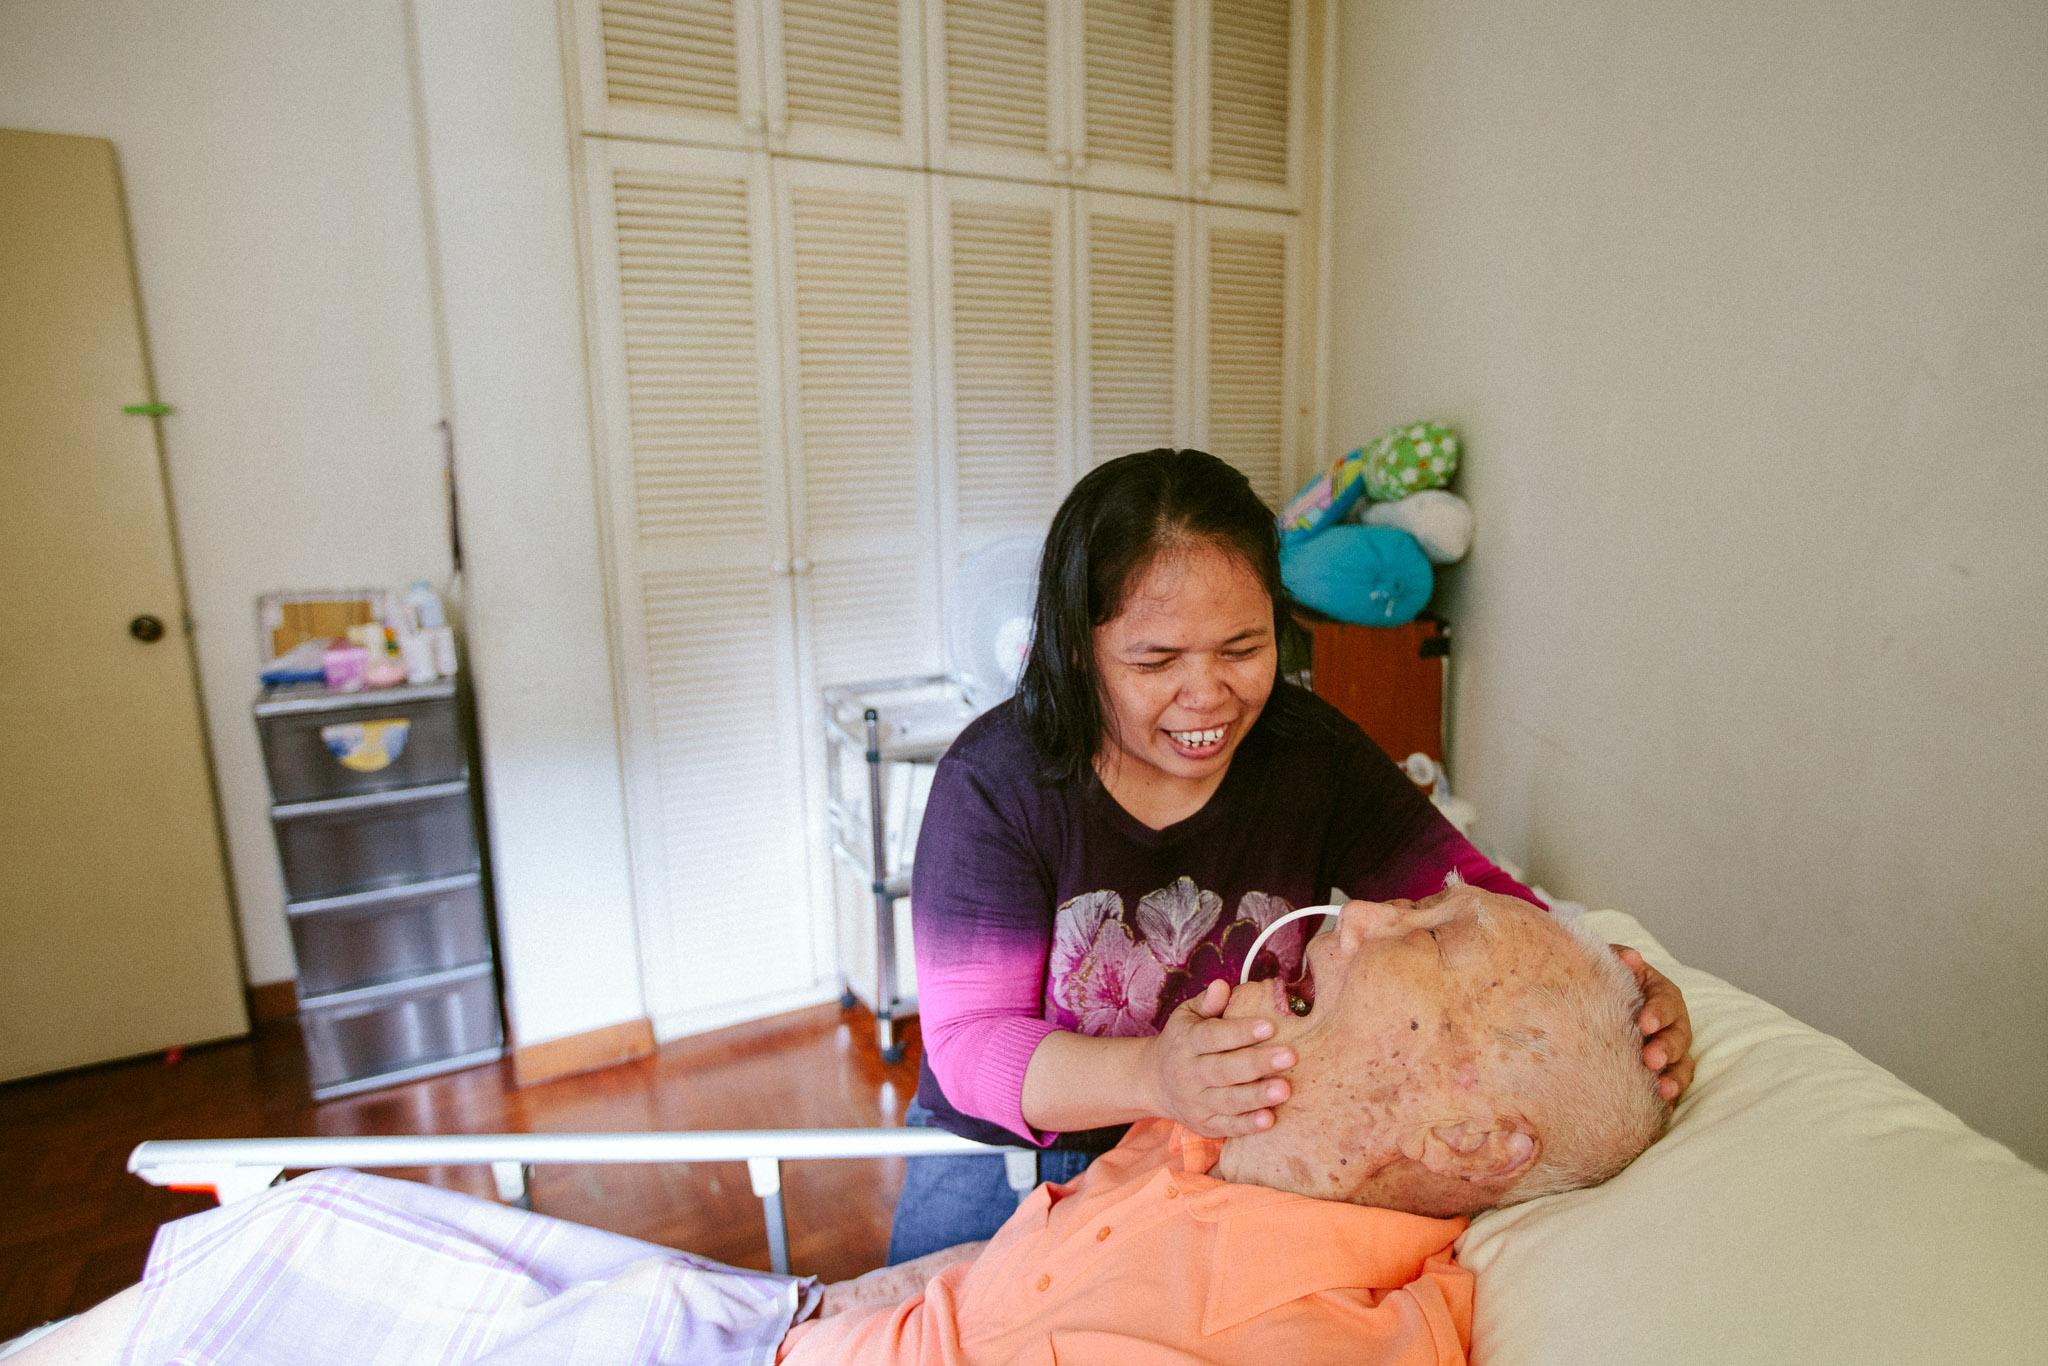 singapore-photographer-hospice-care-005.jpg